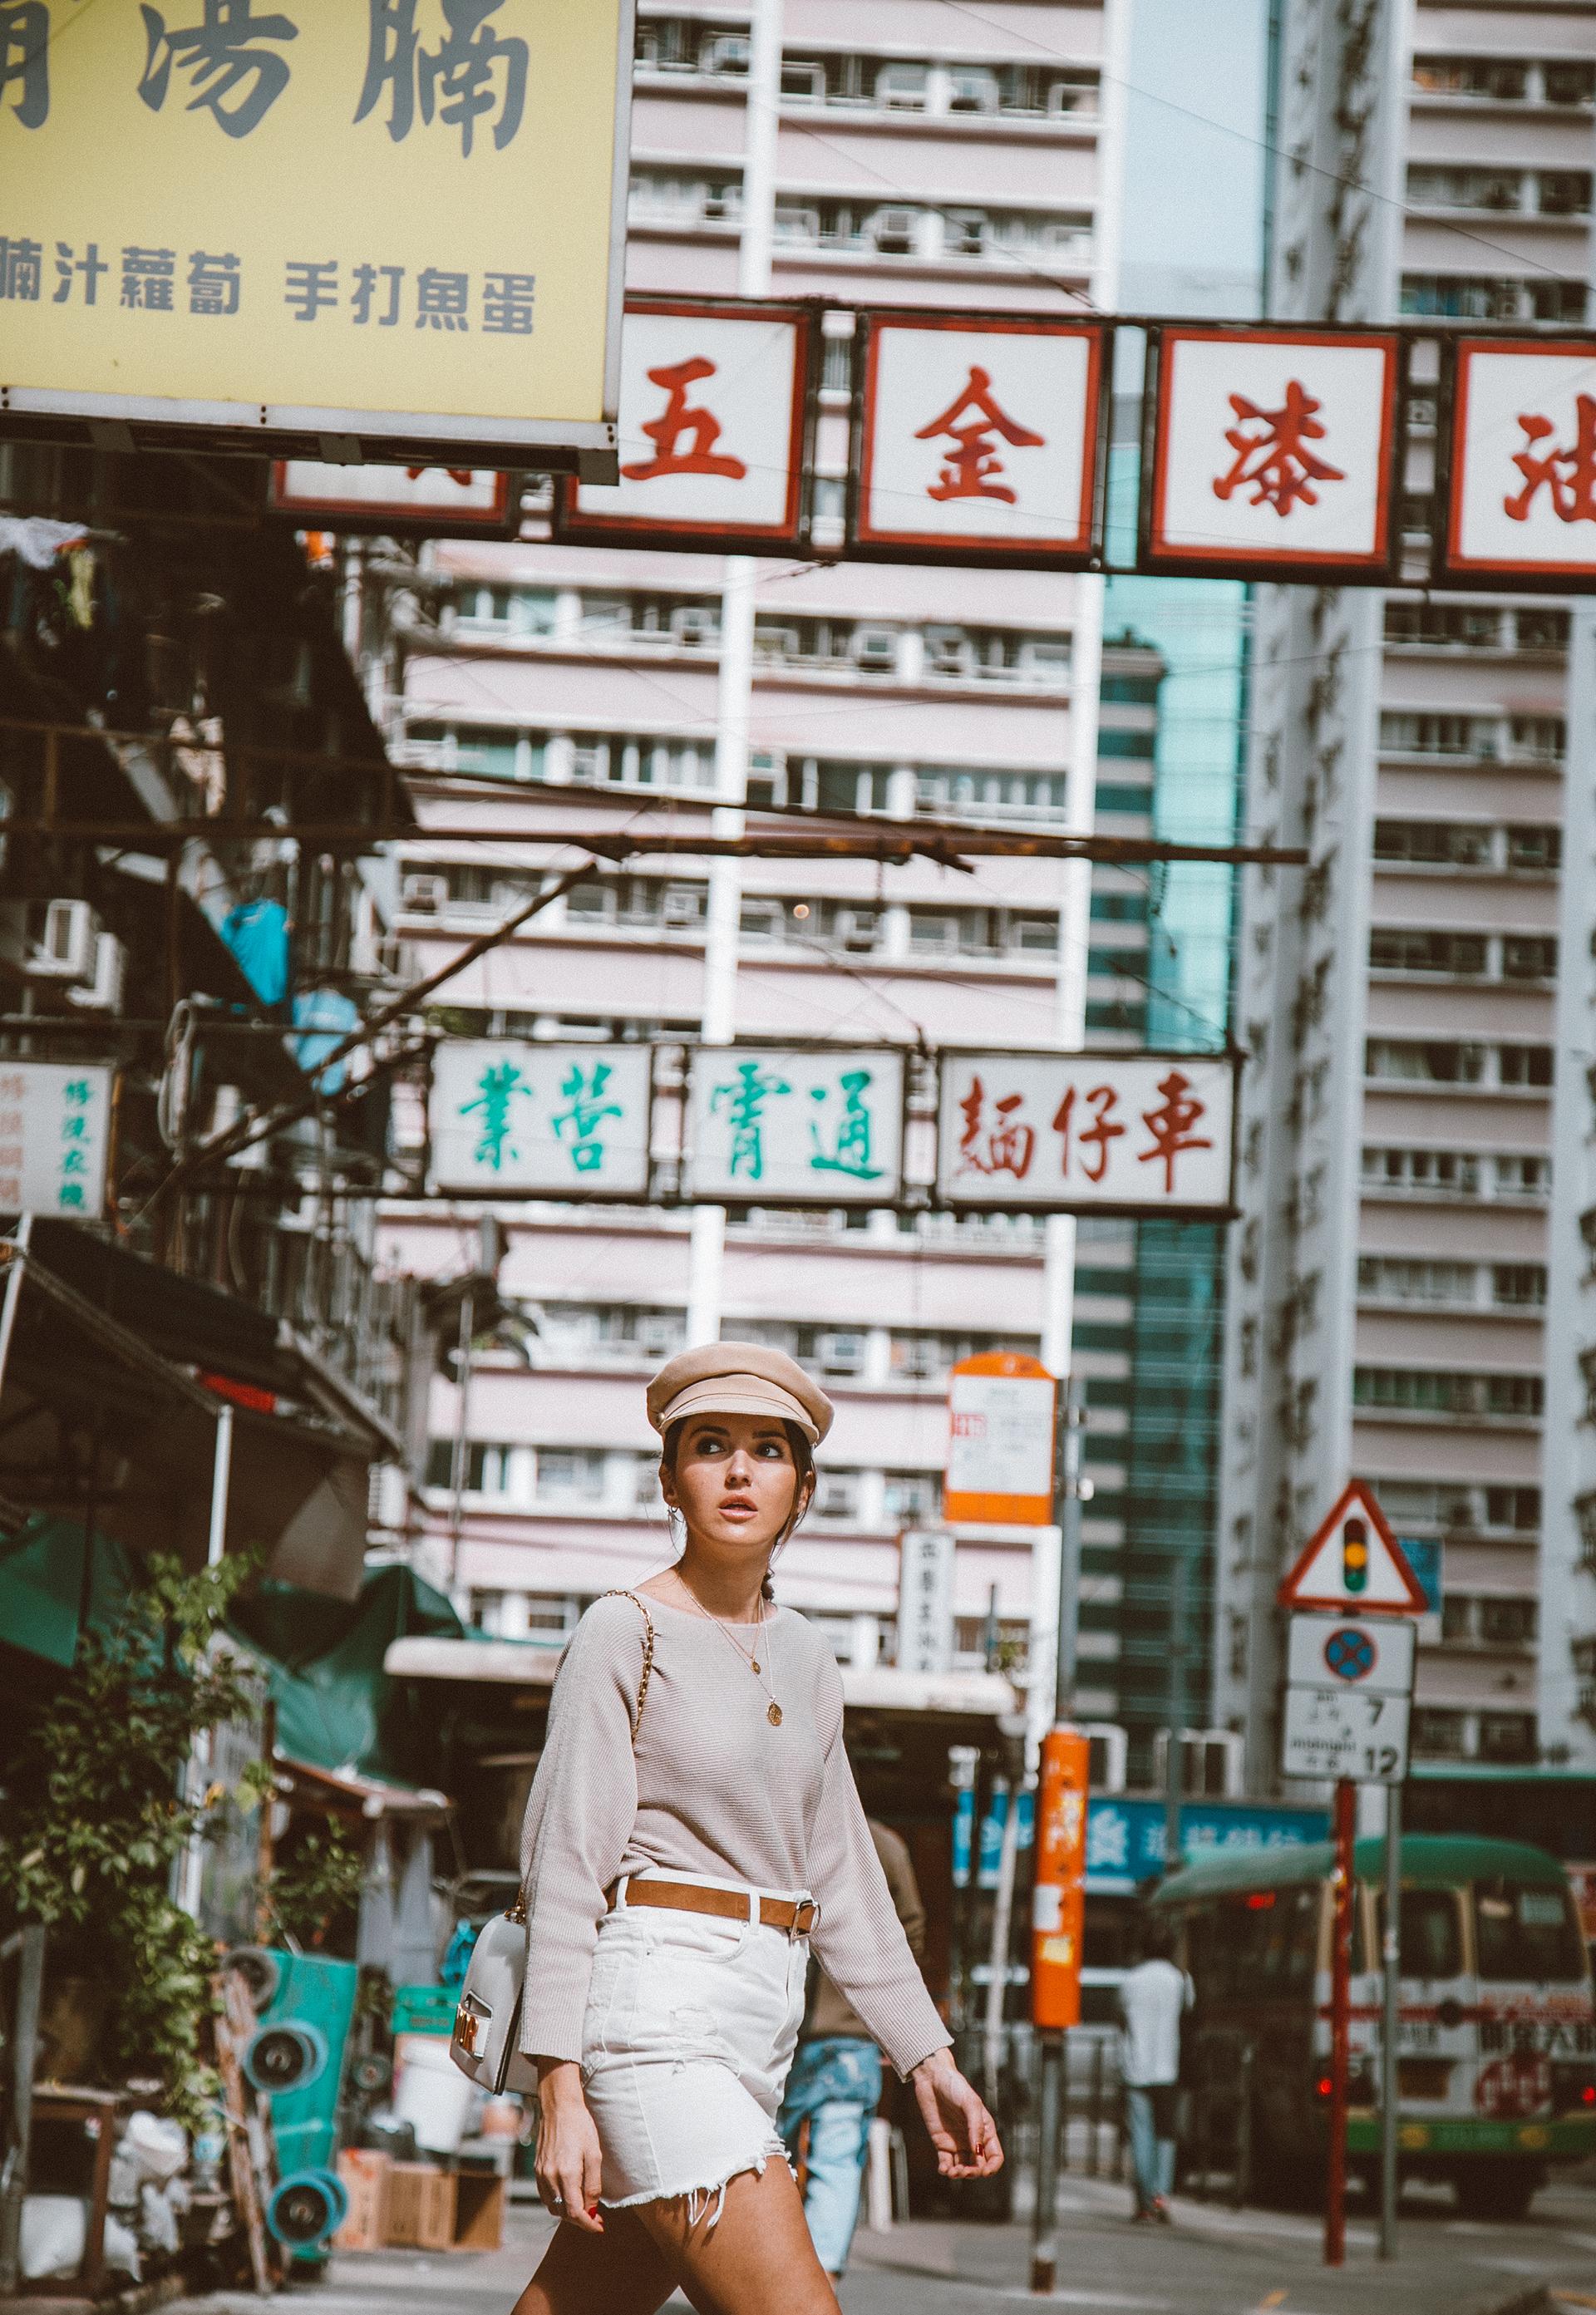 HONG KONG 5-19